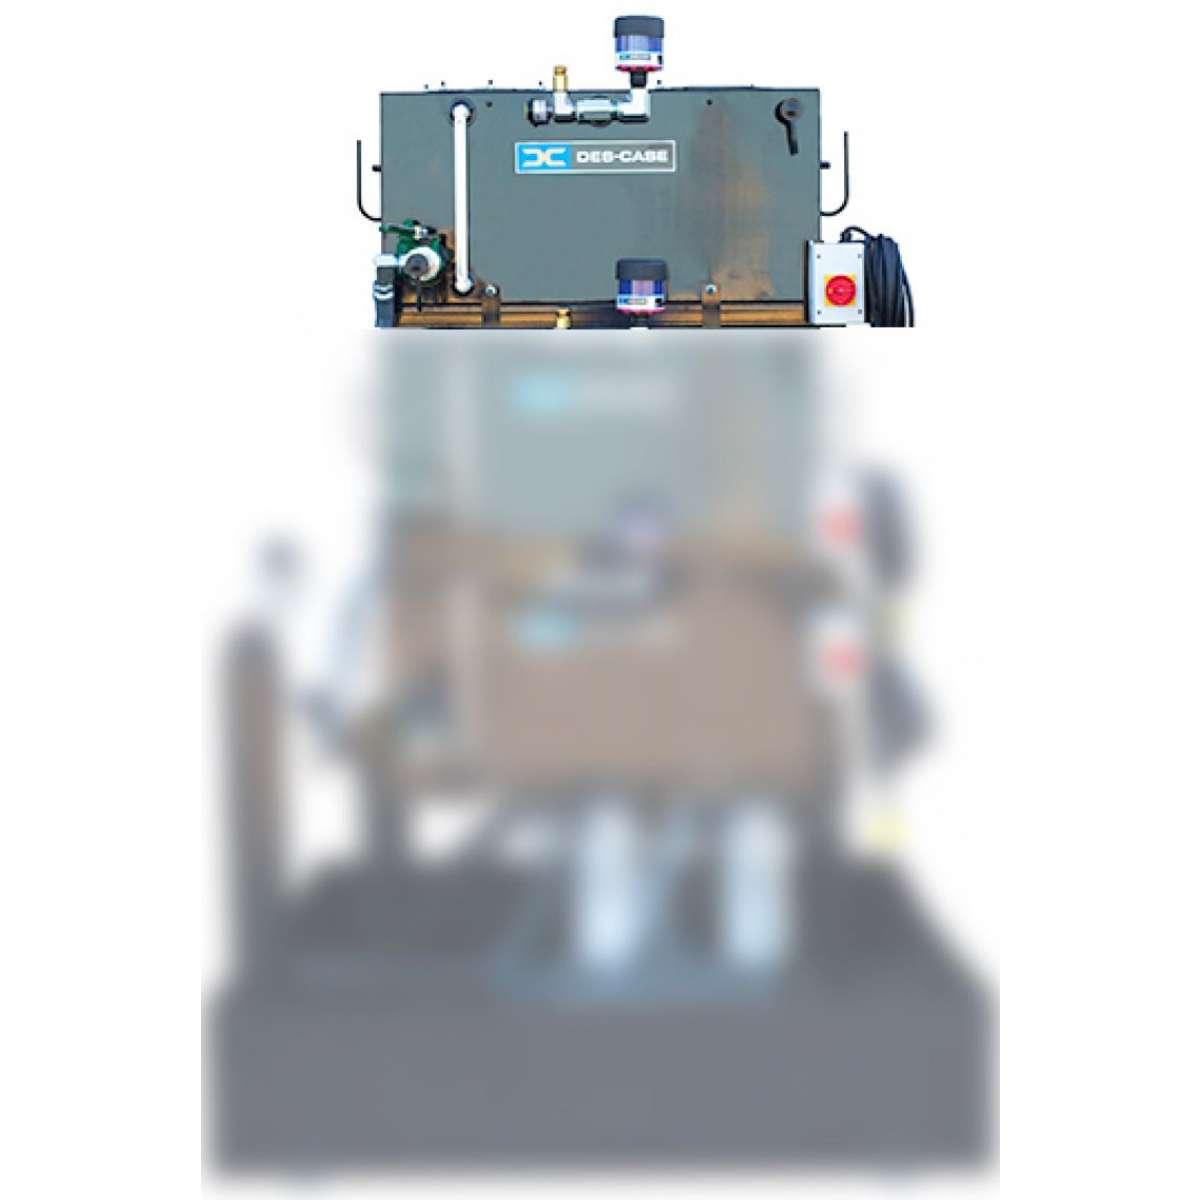 LT Series Lubricant Management System (LT-LMS)